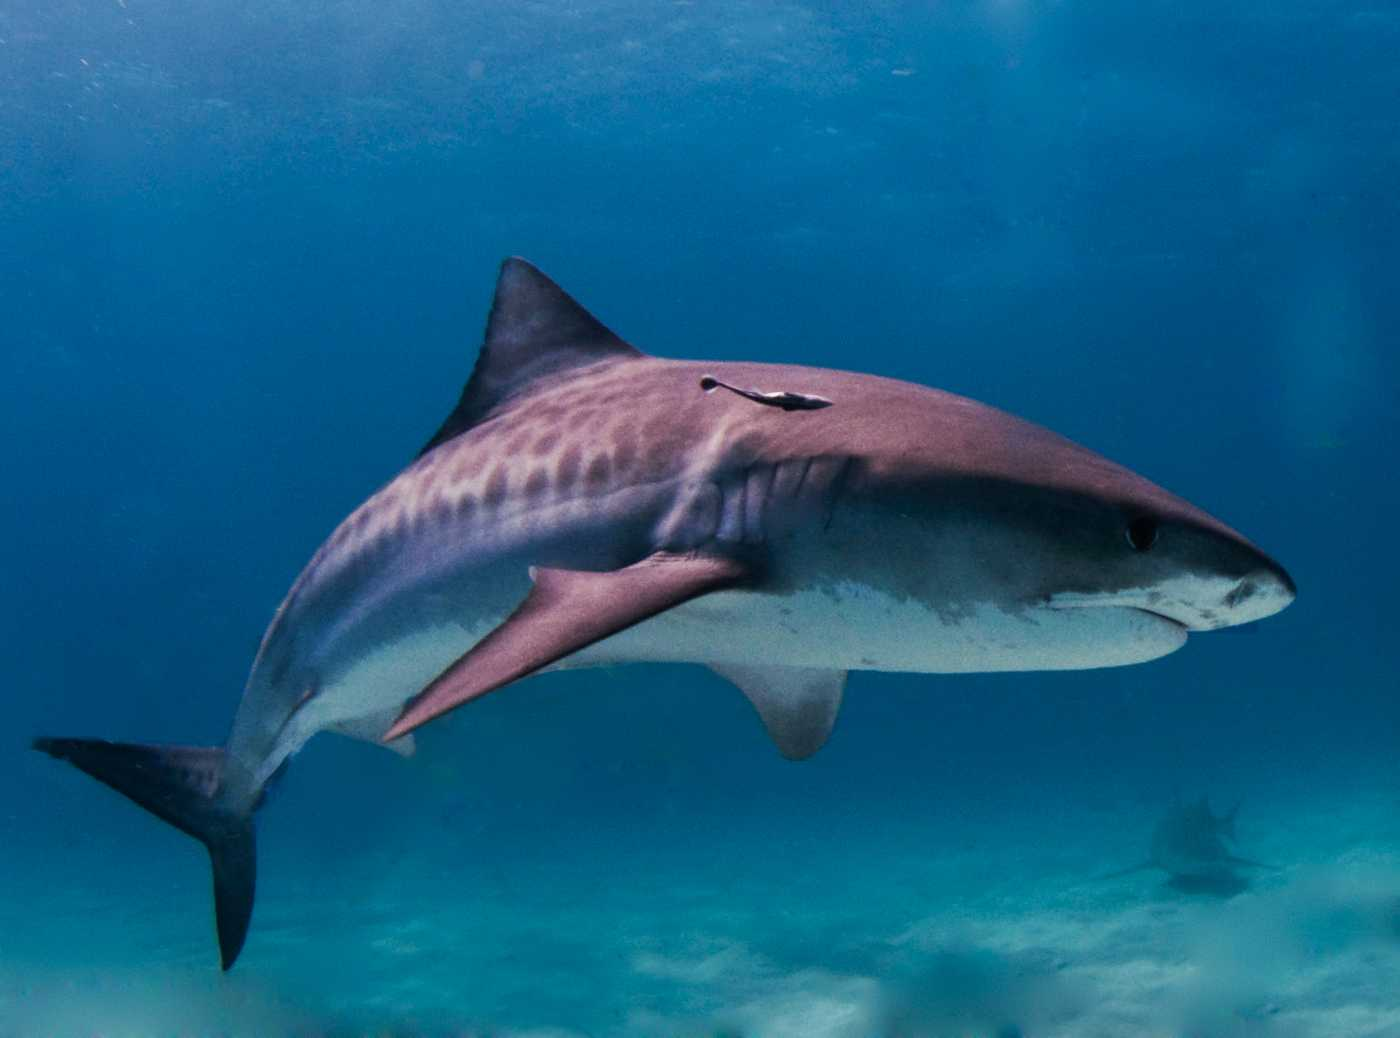 Tackling the myths and misunderstandings of shark attacks